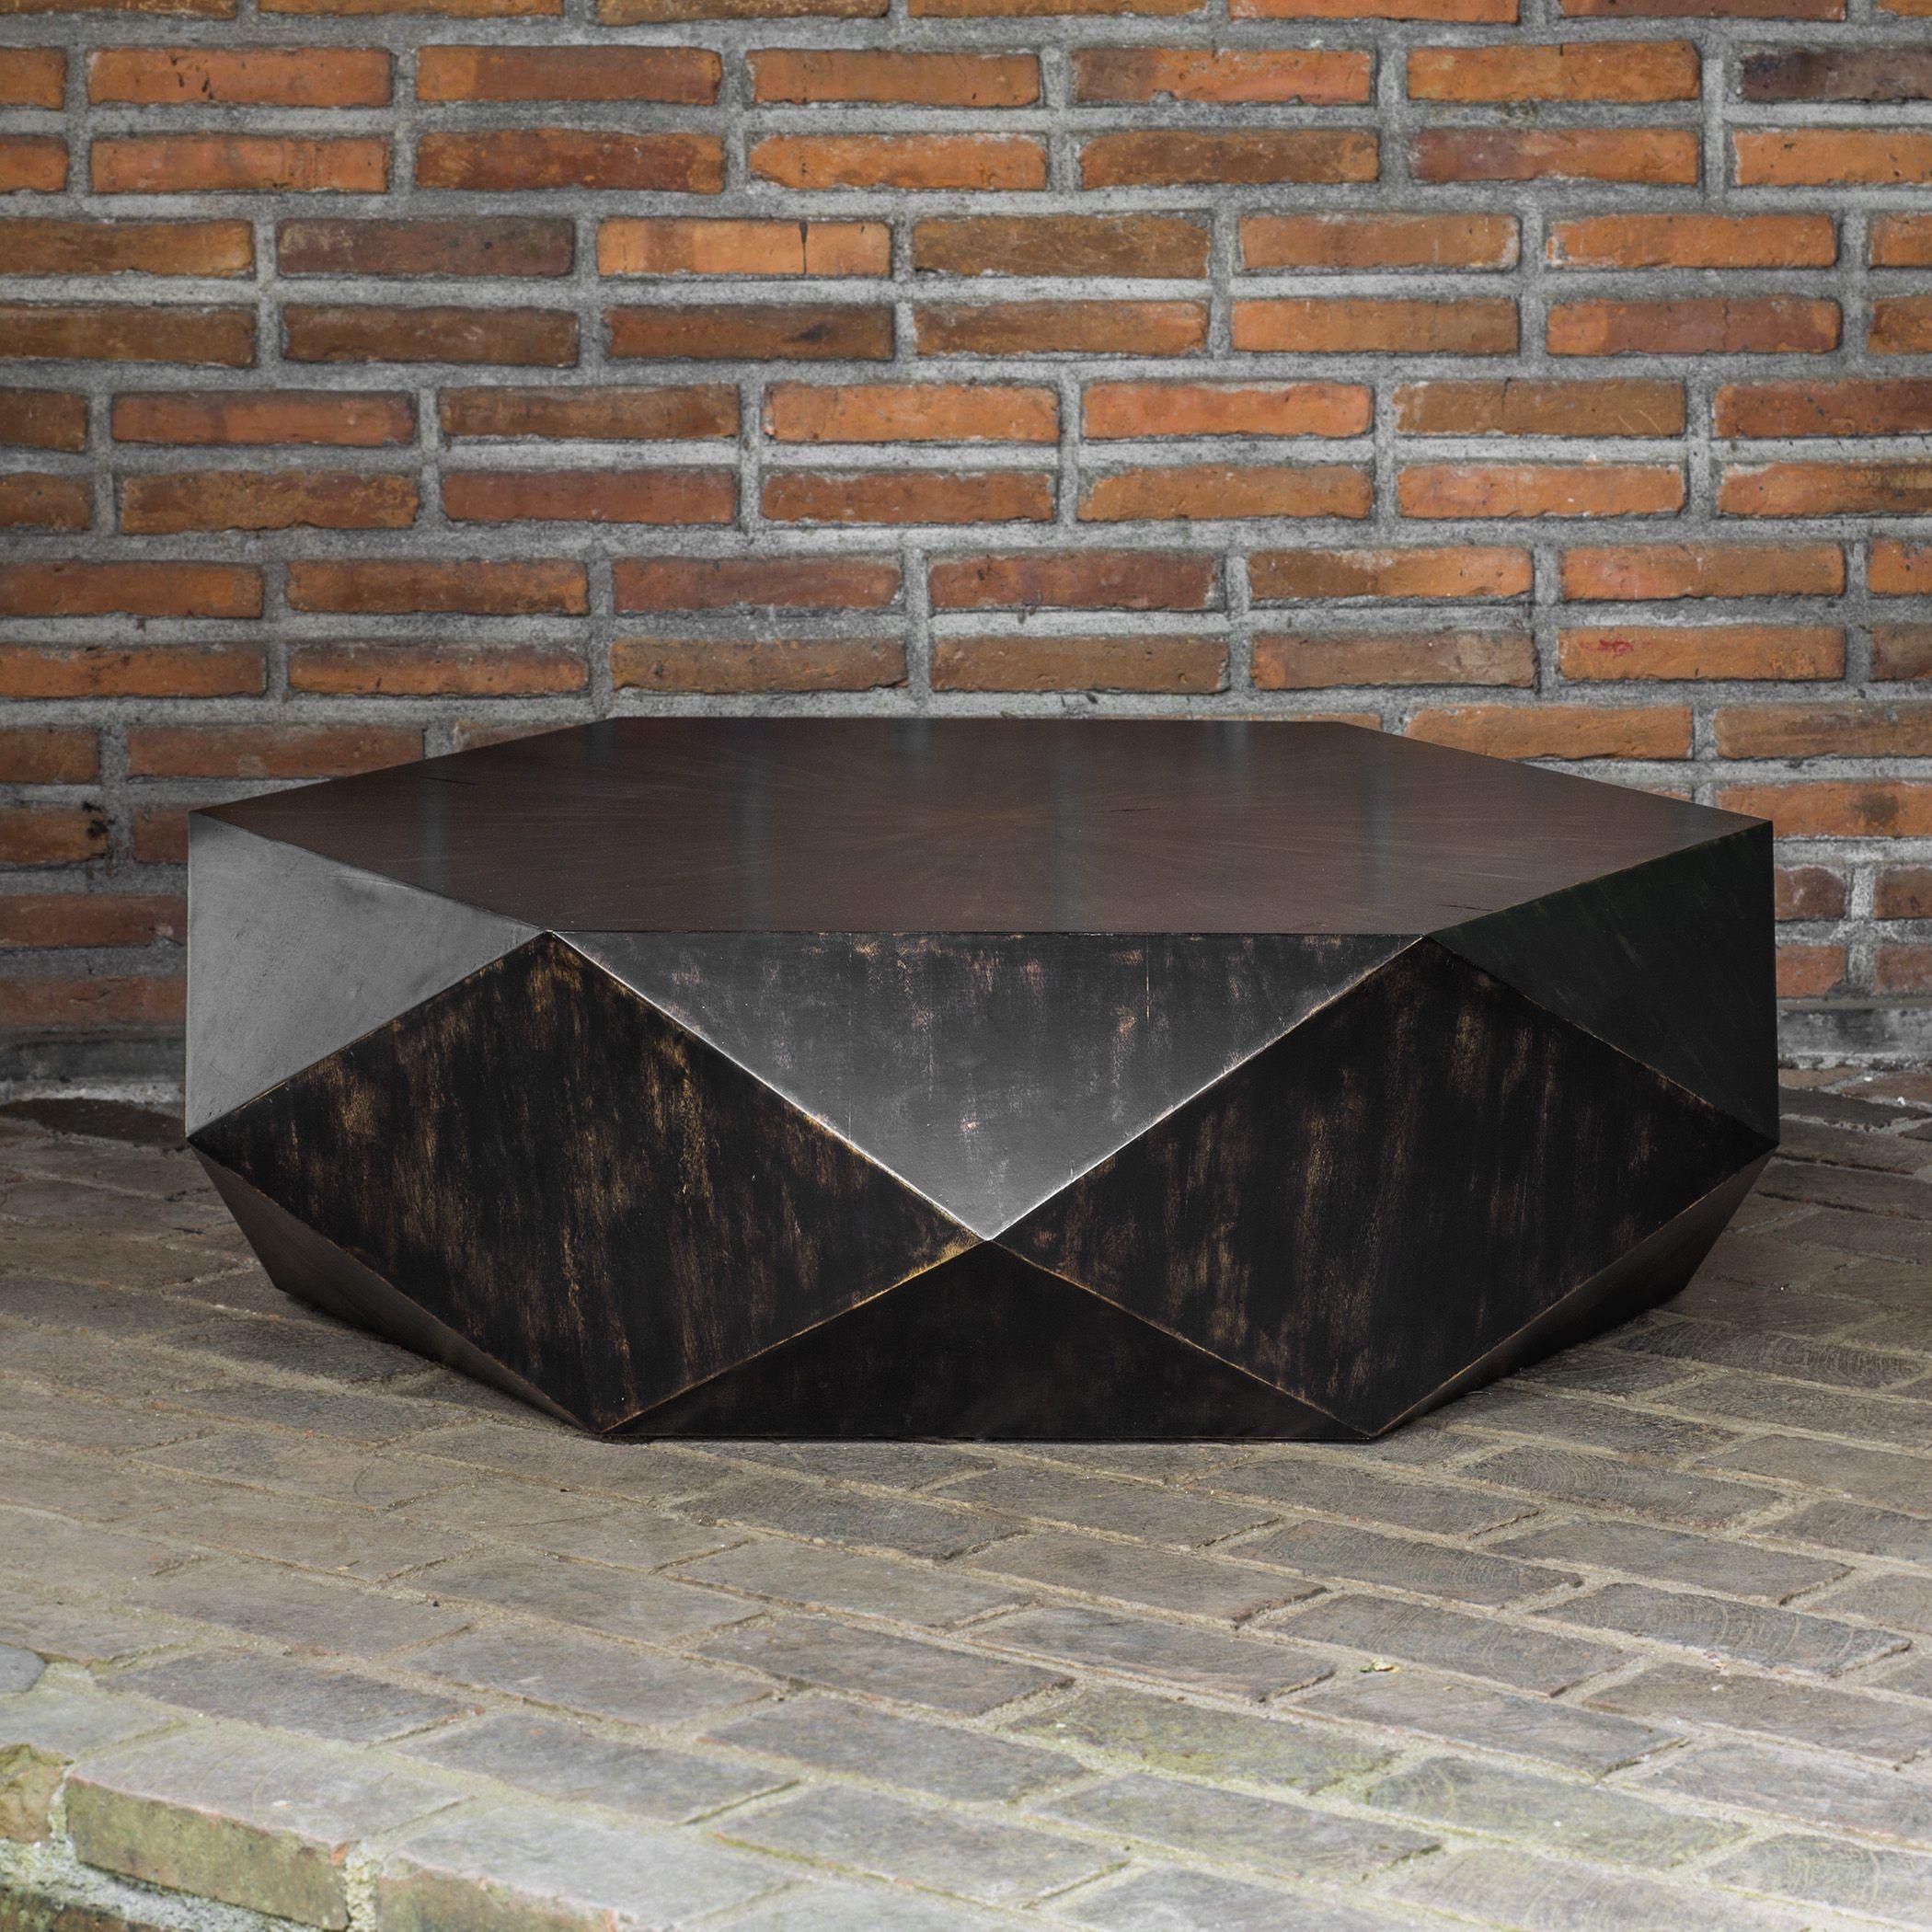 interior furniture own homes phoenix arizona ekenasfiber rh ekenasfiber johnhenriksson se